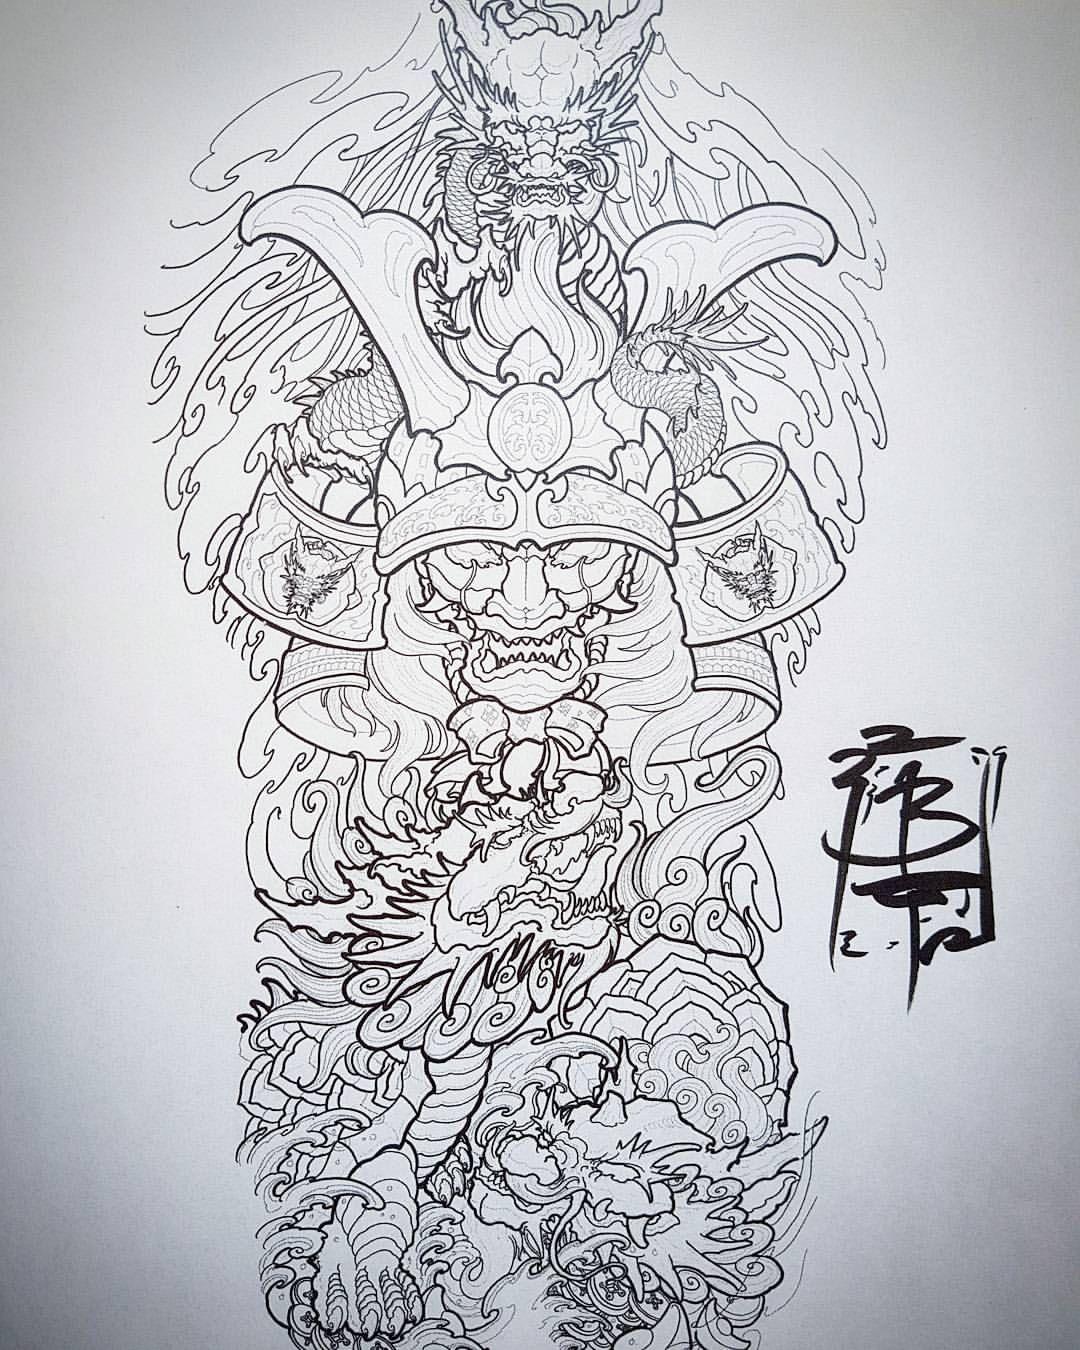 f861df277 Drawing for the turtleback i just started, dragon 🐉 hanya samurai 👹 and a couple  dragon turtles 🐢🐢 #tattoos #fullback #tattoo #tiger #snake…